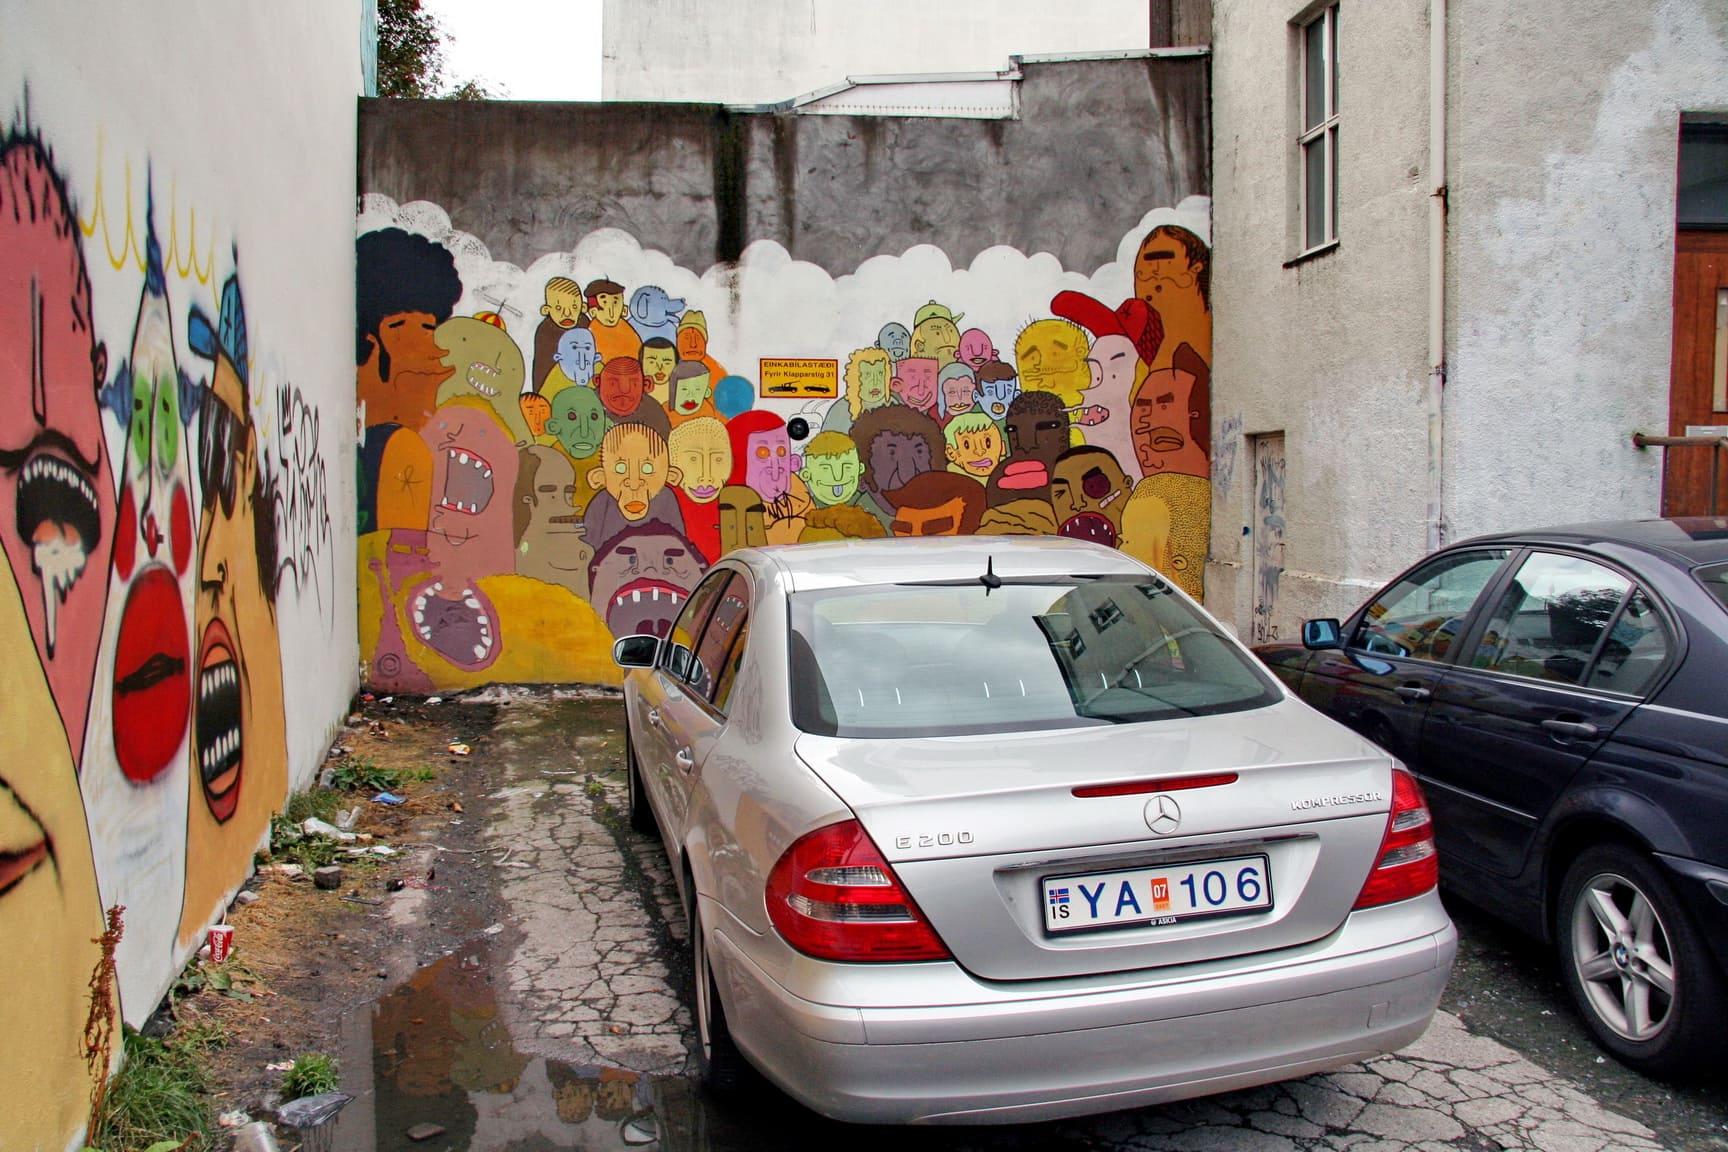 Граффити – визитная карточка Рейкьявика